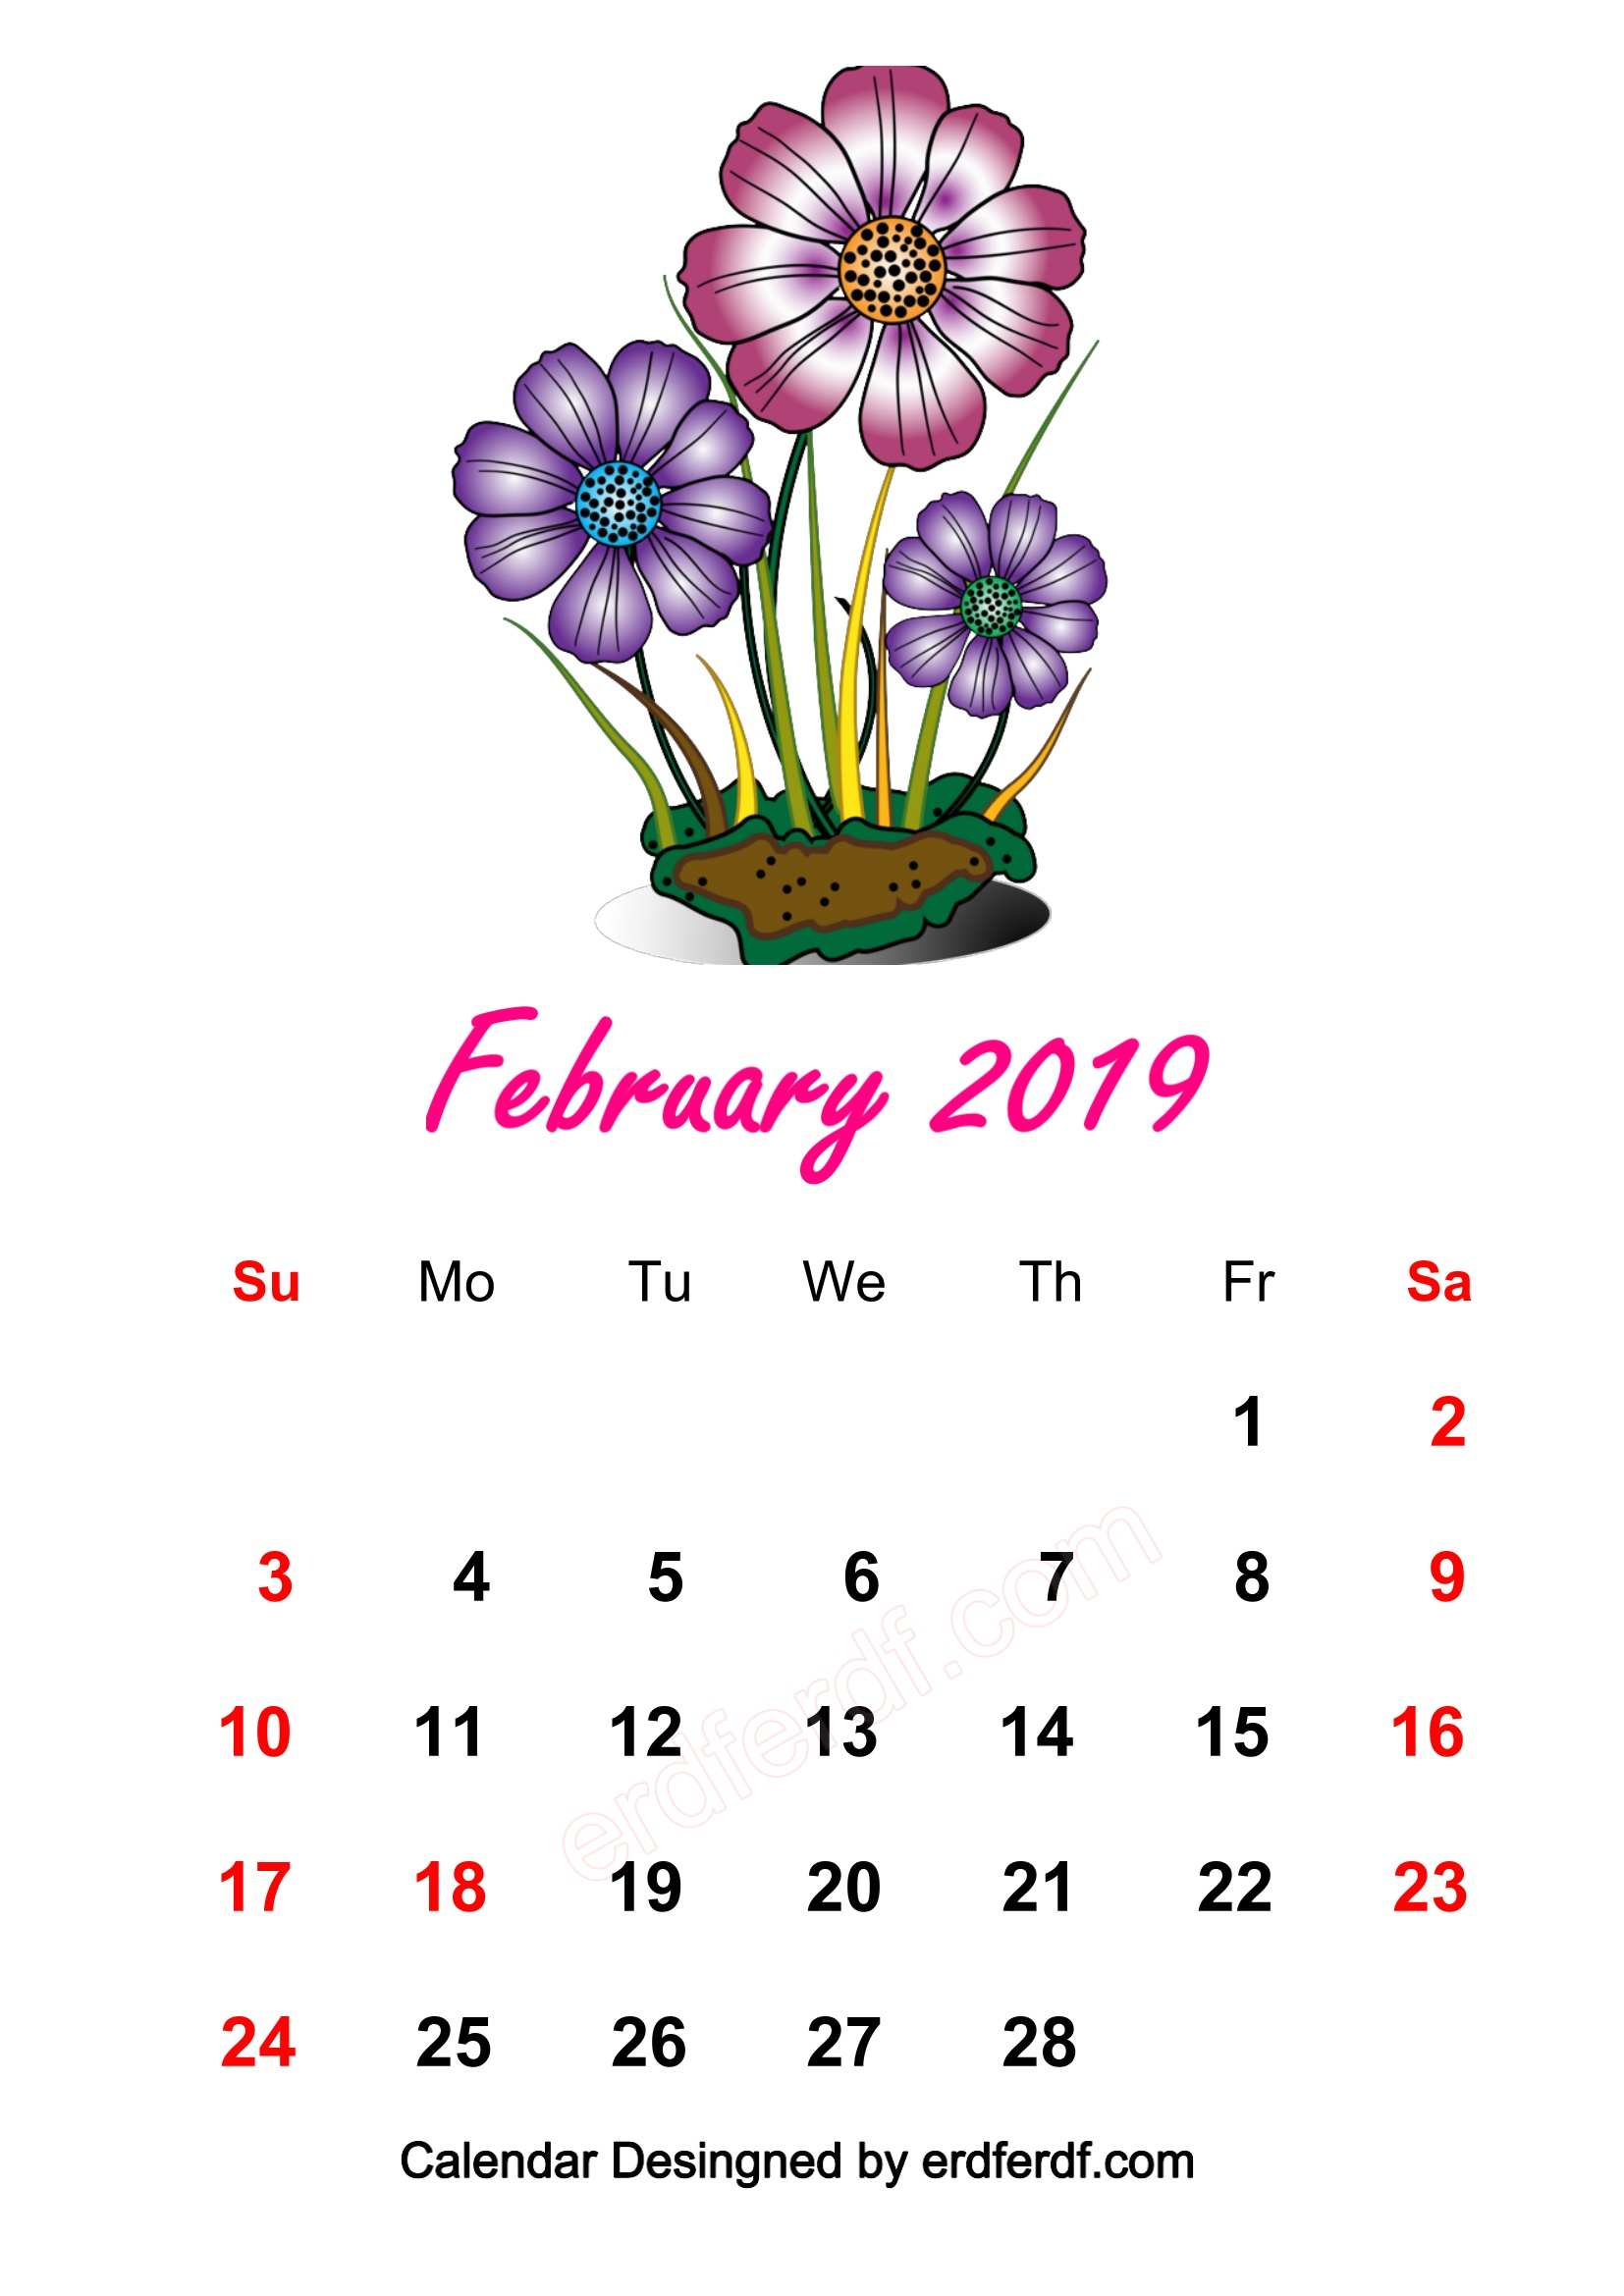 4 February 2019 HD Calendar Wallpapers